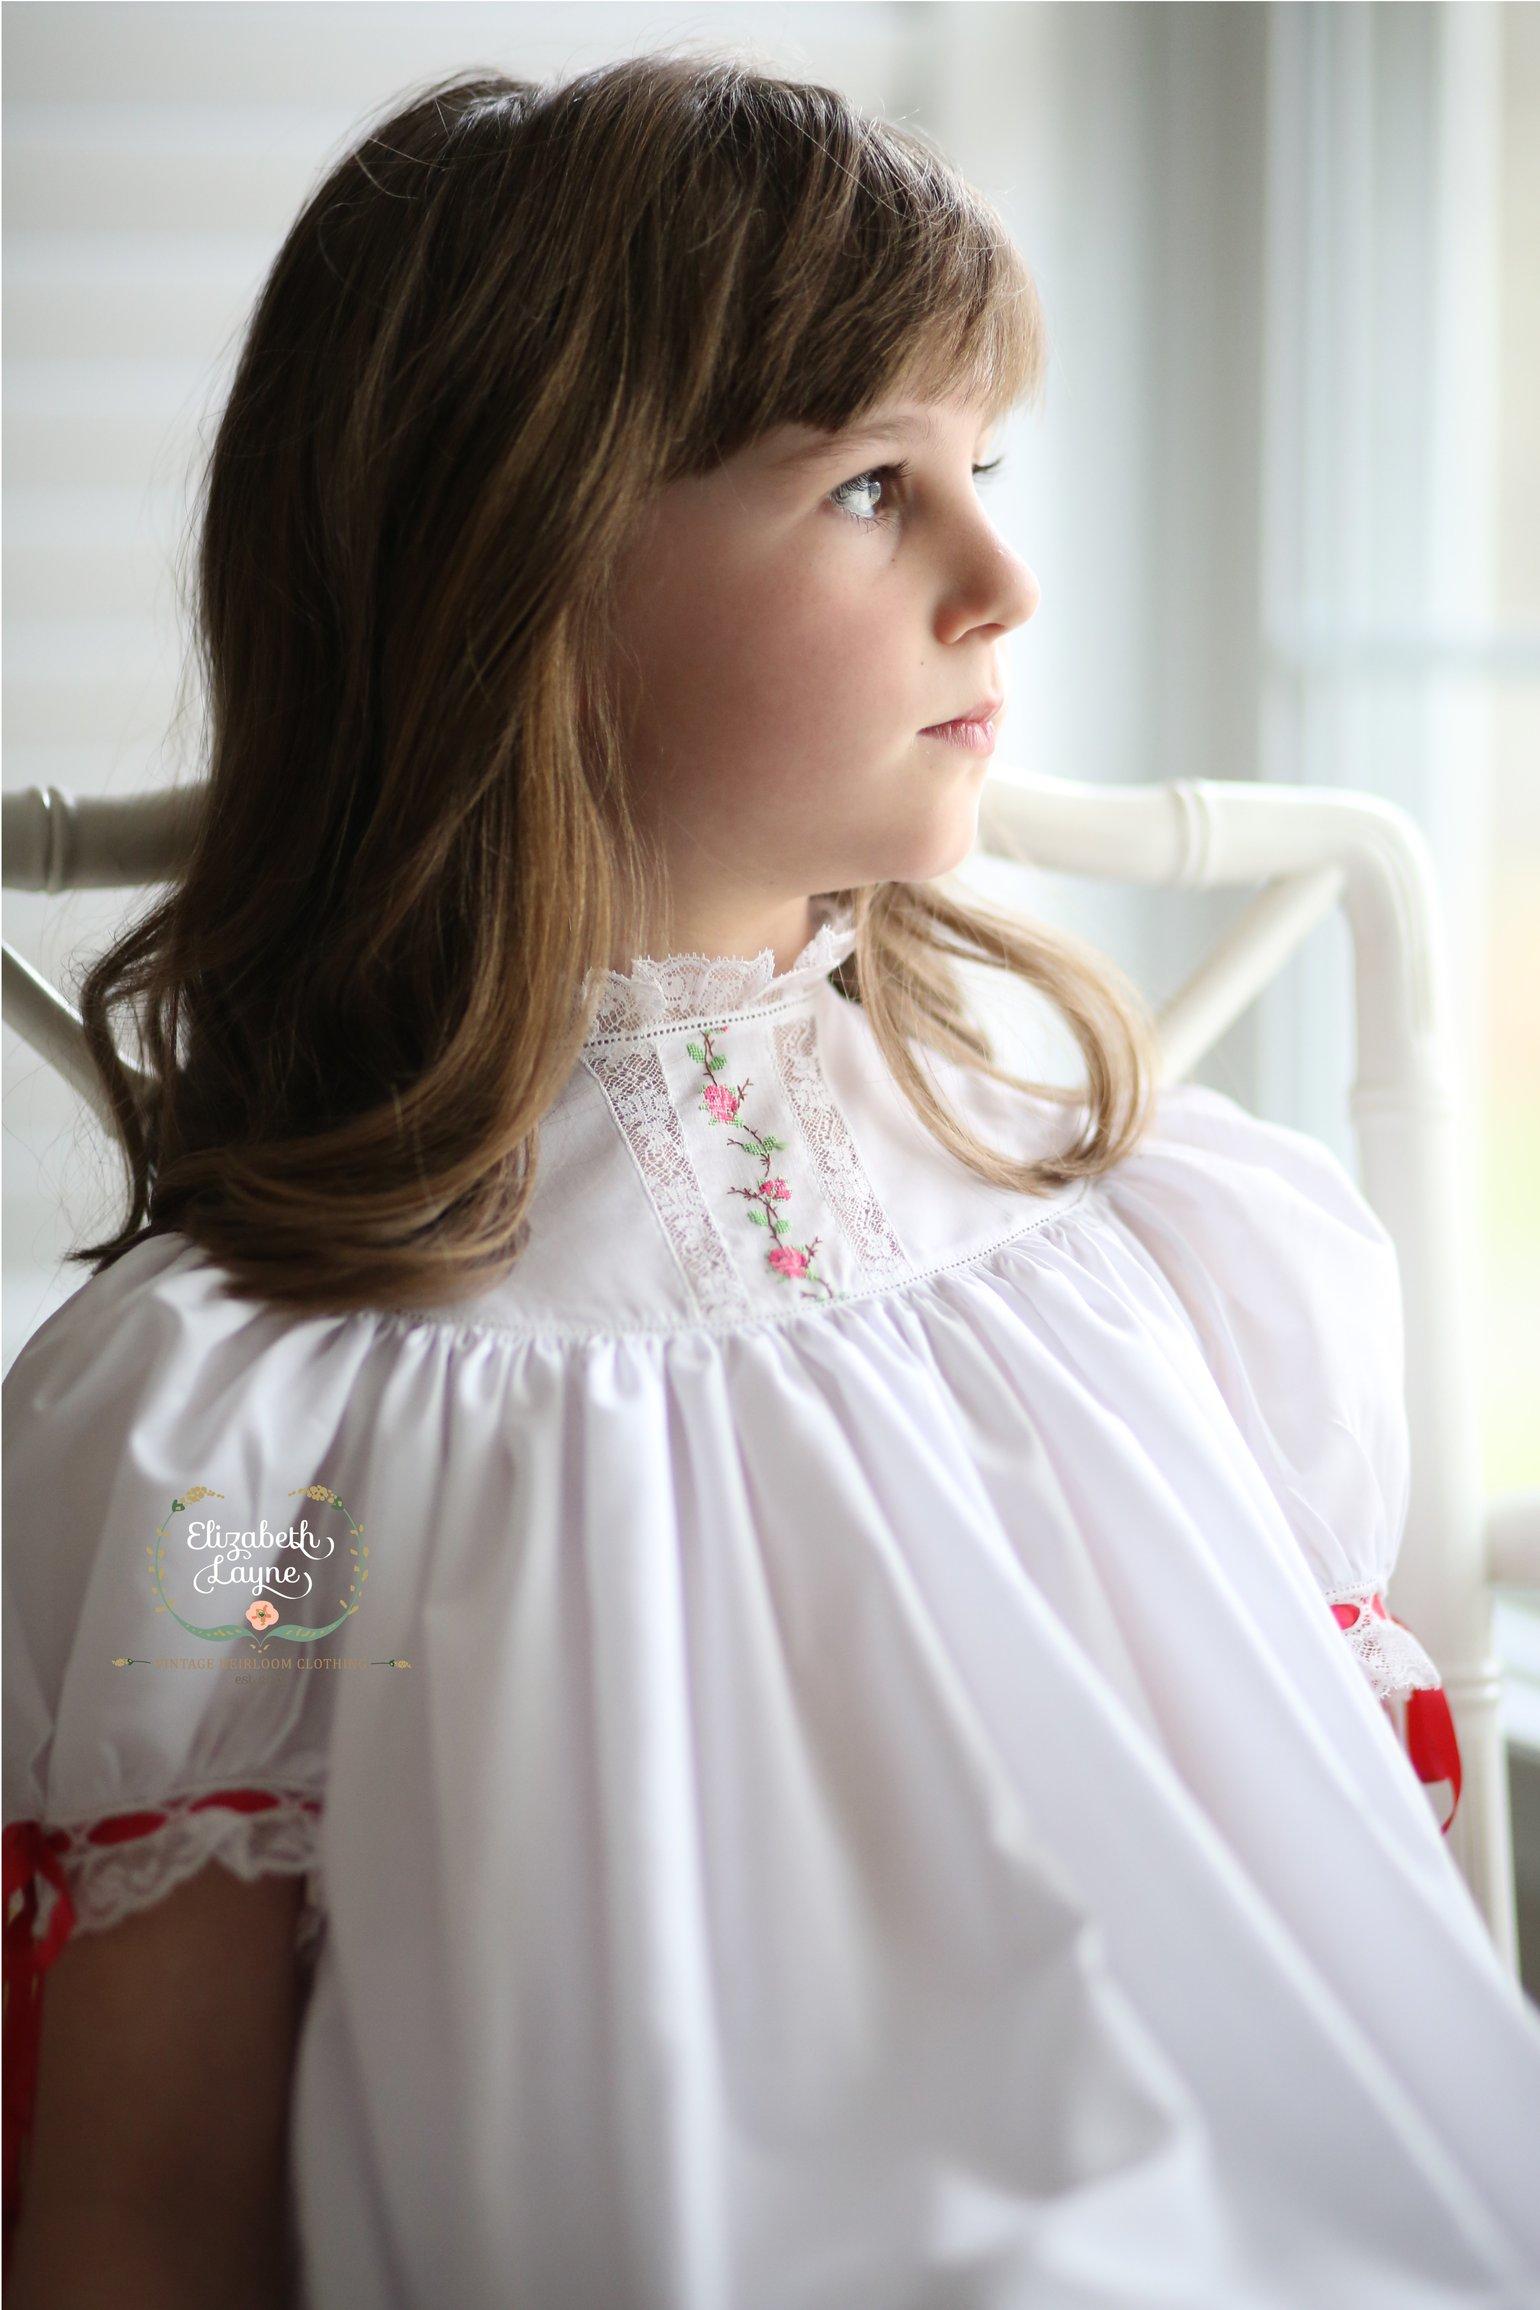 Image of Rose Handloom Insertion Dress